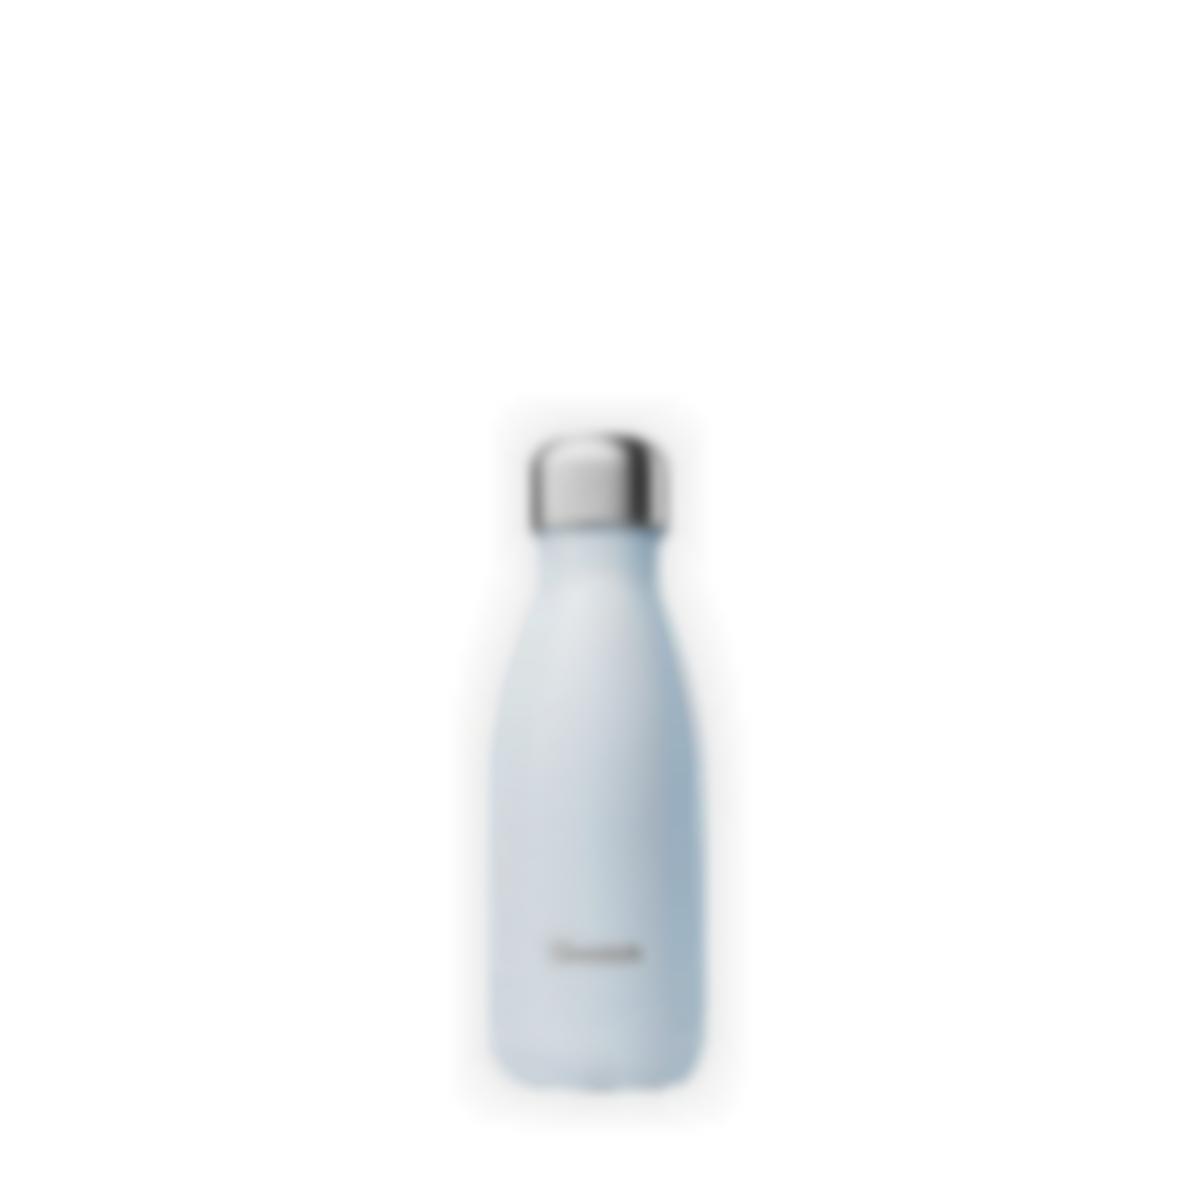 Garrafa isotérmica Pastel Azul - 260ml - Qwetch